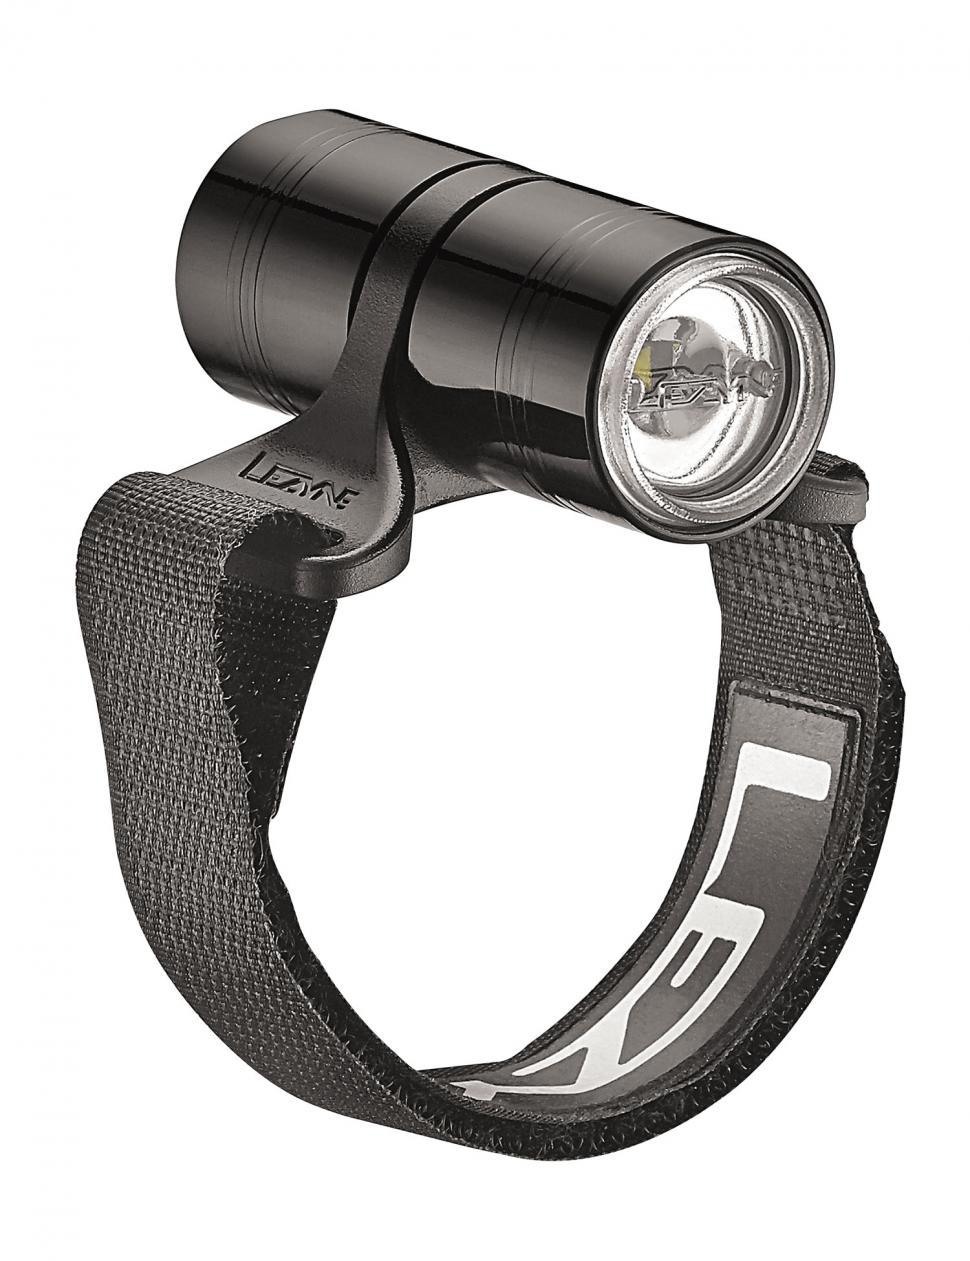 Product-led-femtoduo-zoom1.jpg